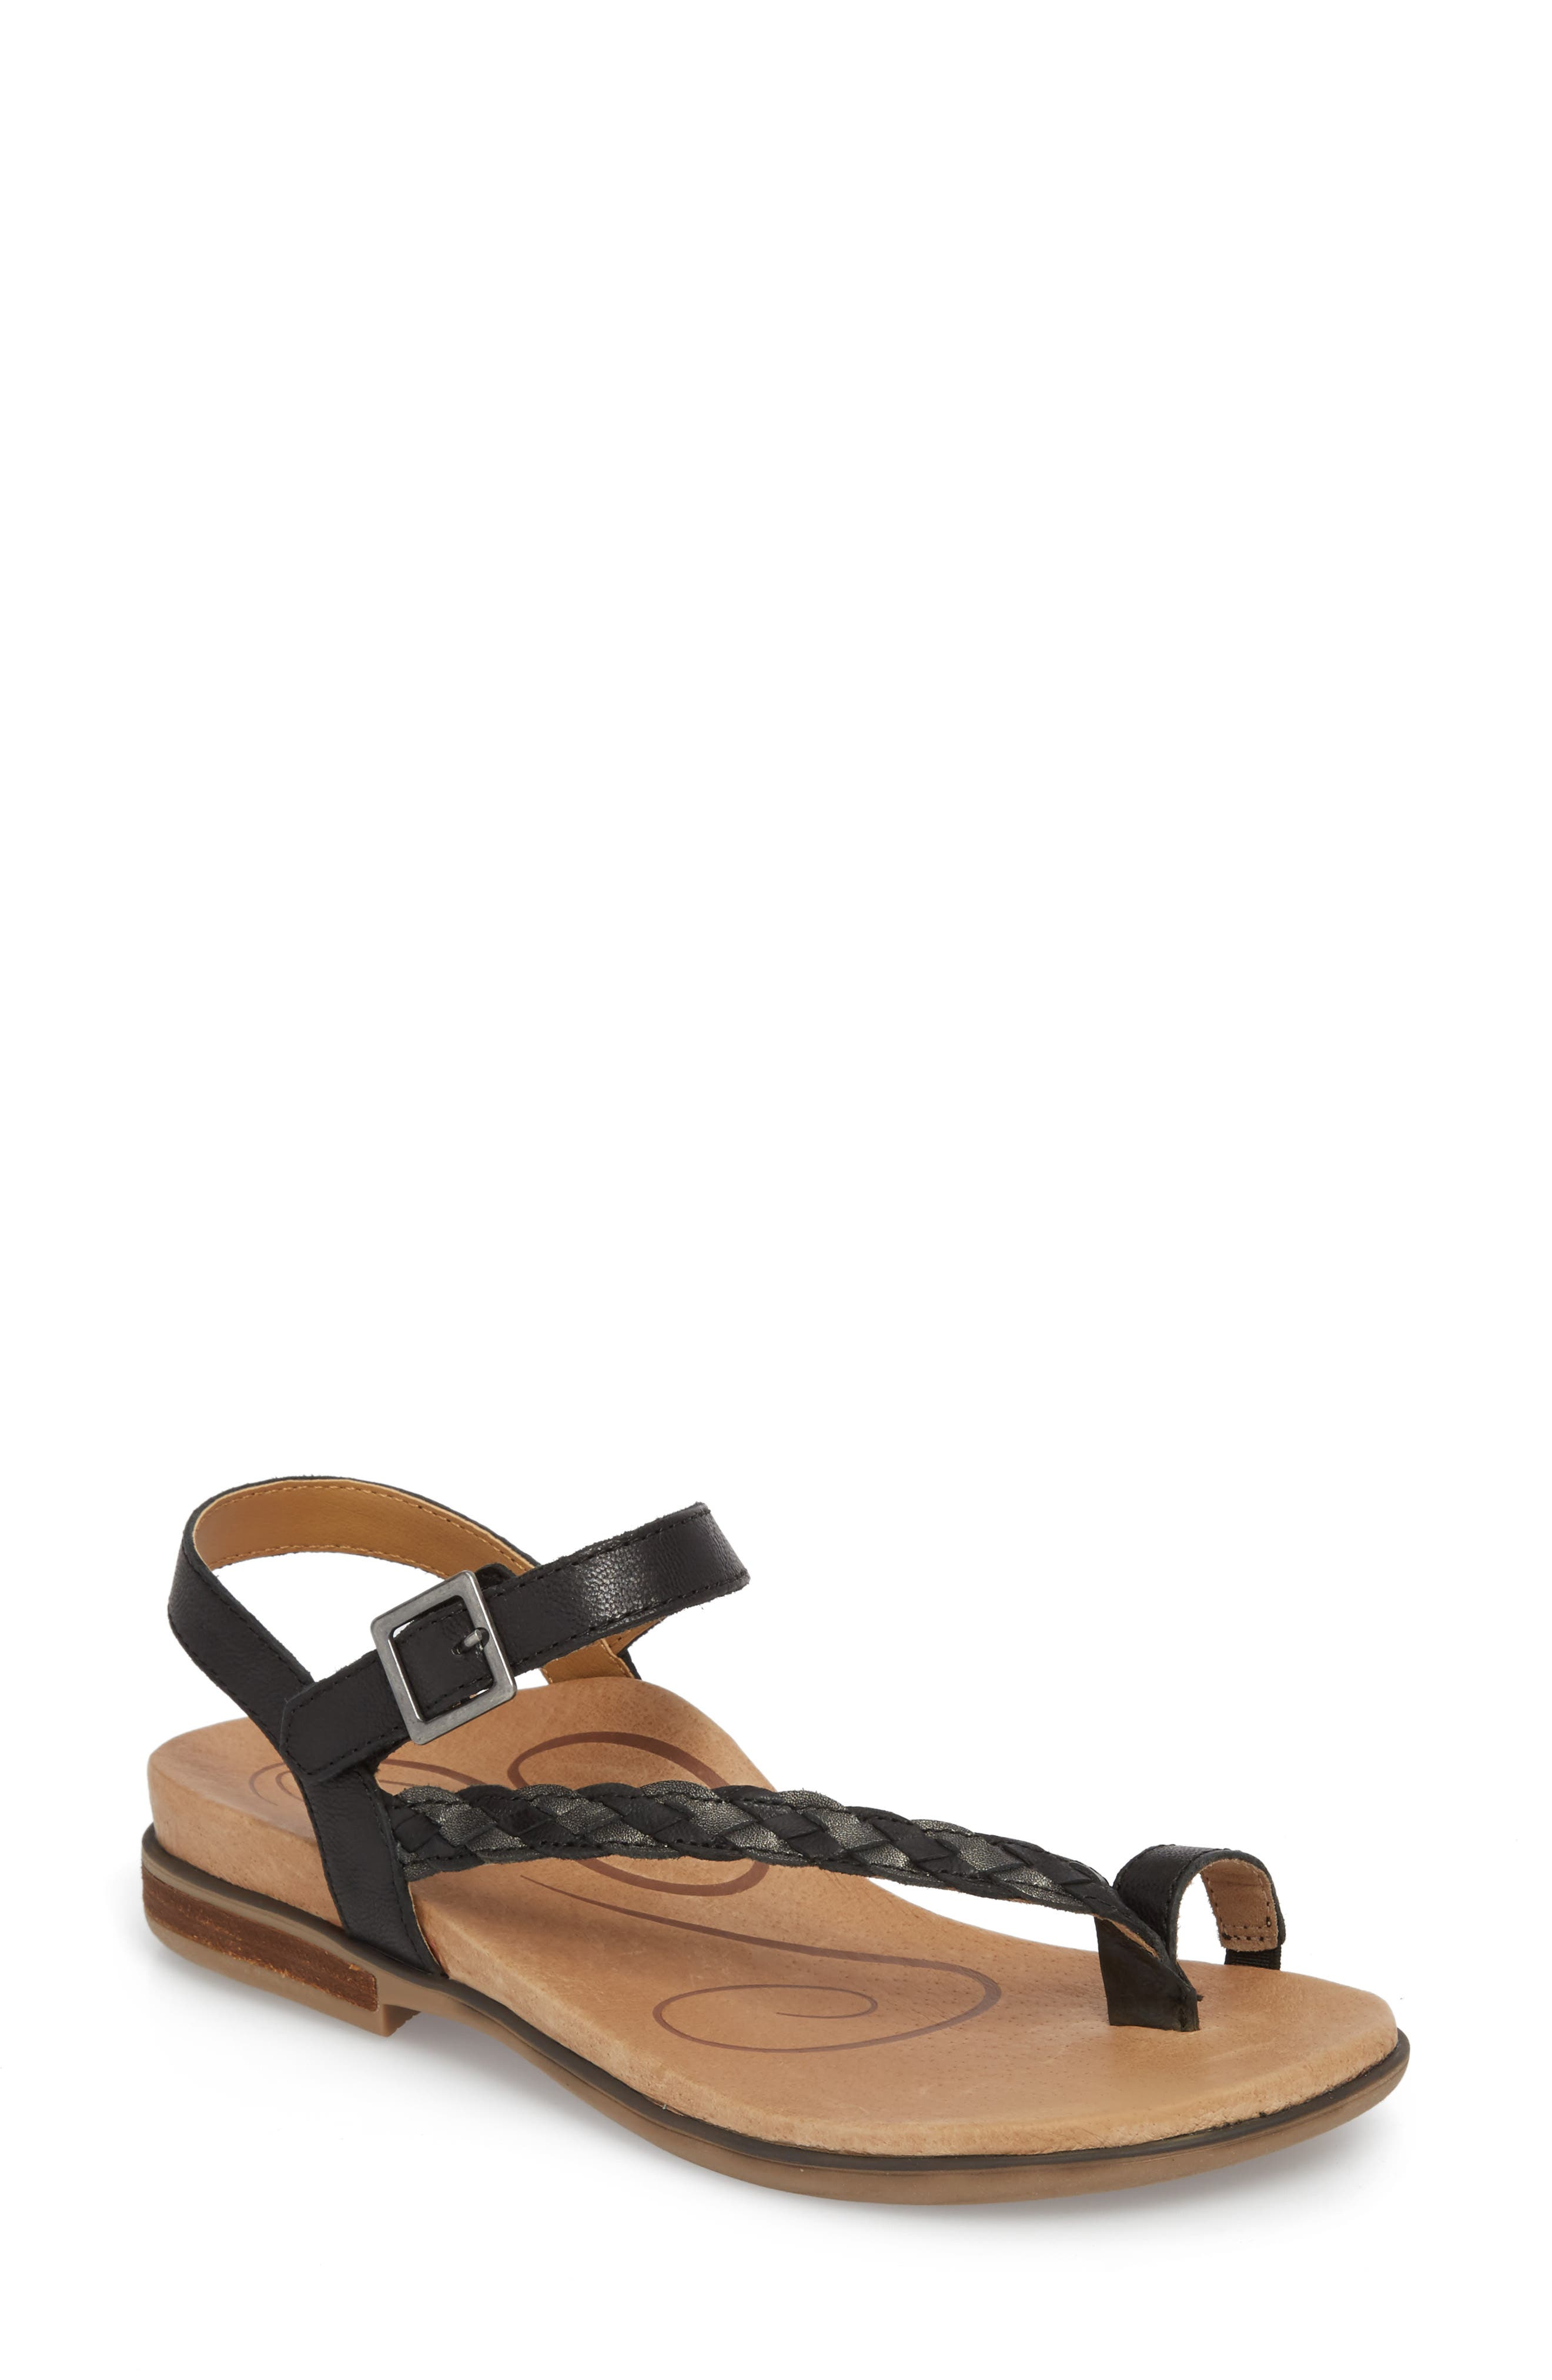 AETREX, Evie Braided Strap Sandal, Main thumbnail 1, color, BLACK LEATHER